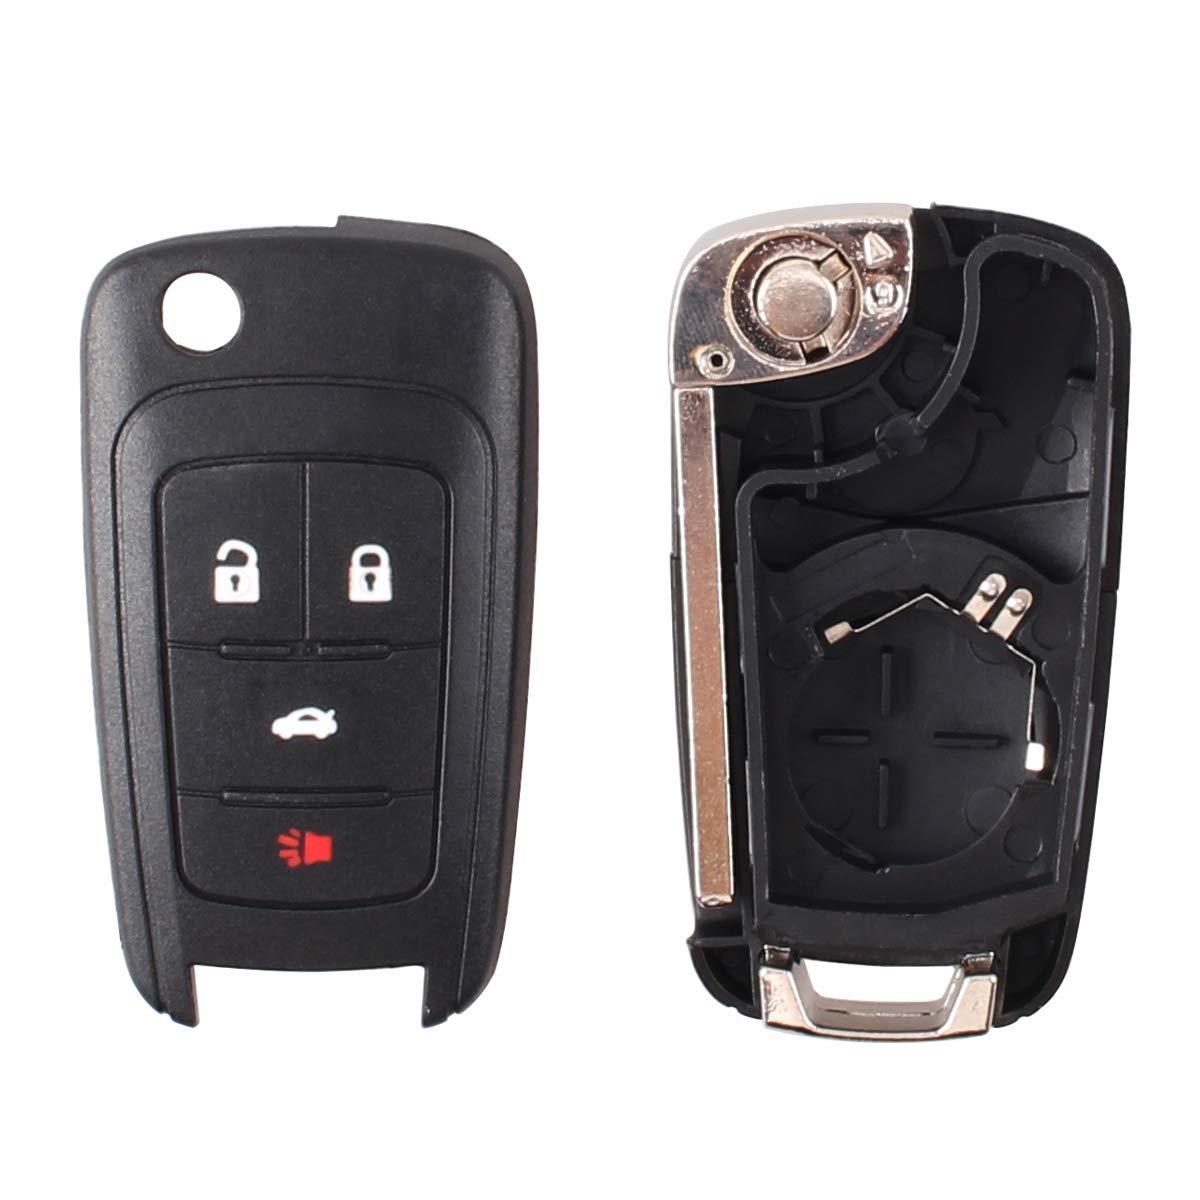 Heart Horse 5 Button Keyless Entry Remote for Camaro Cruze Equinox Malibu Sonic Spark Volt No Chip 2010-2013 HuihuangAMZus sku1393